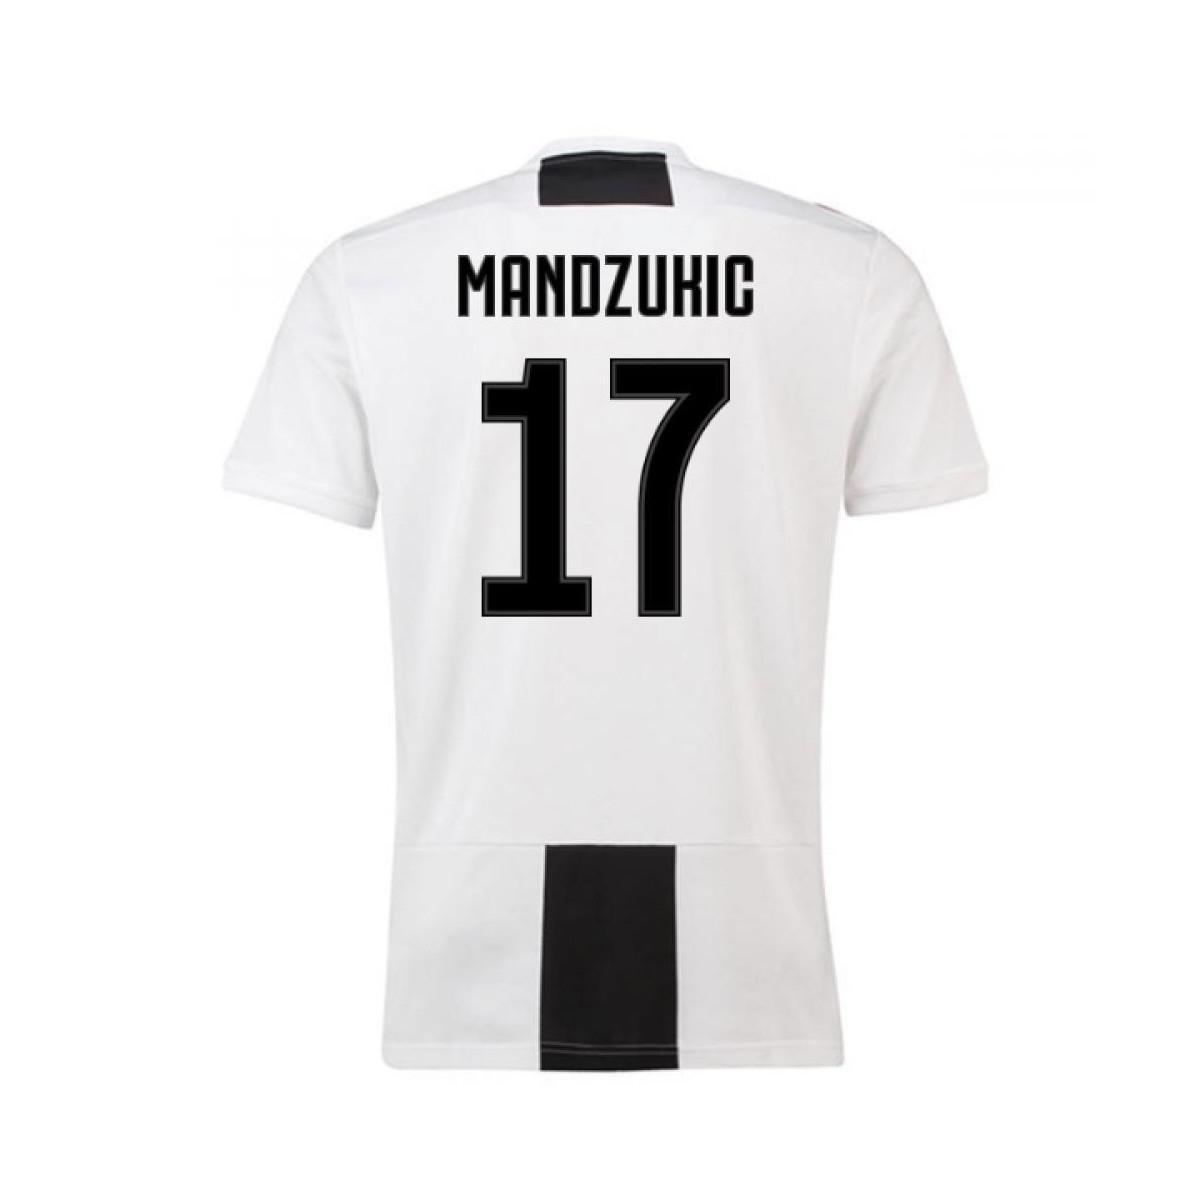 e53258a7acc adidas 2018-19 Juventus Home Shirt (mandzukic 17) - Kids Men s T ...